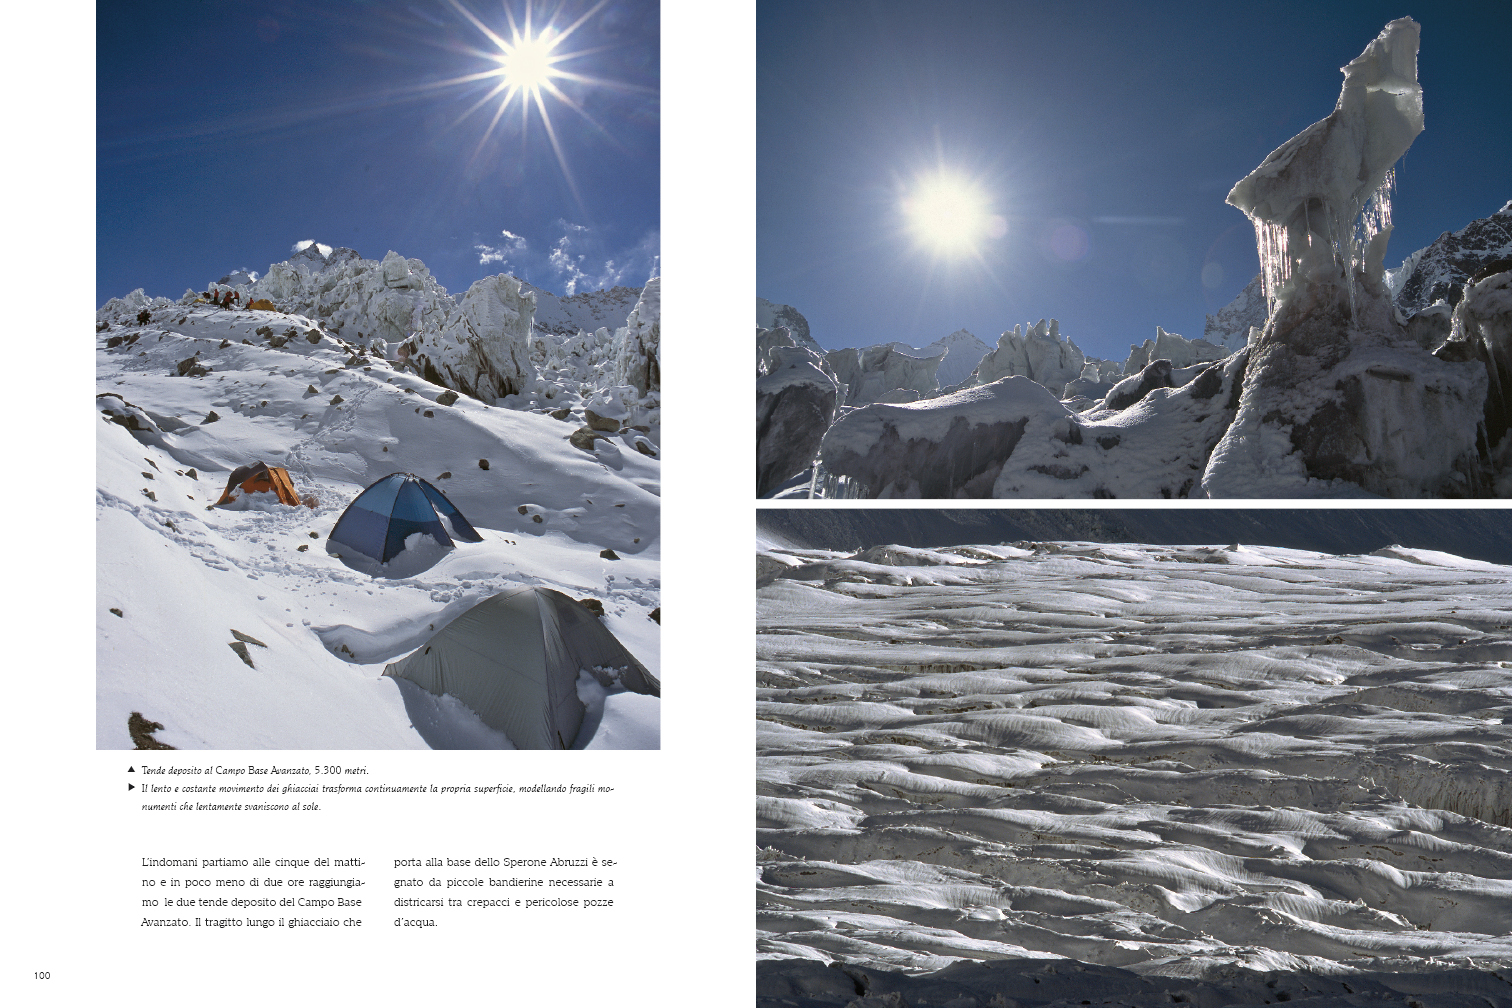 K2 EXPEDITION 1954-2004 Giuseppe Ghedina Fotografo - 052.jpg